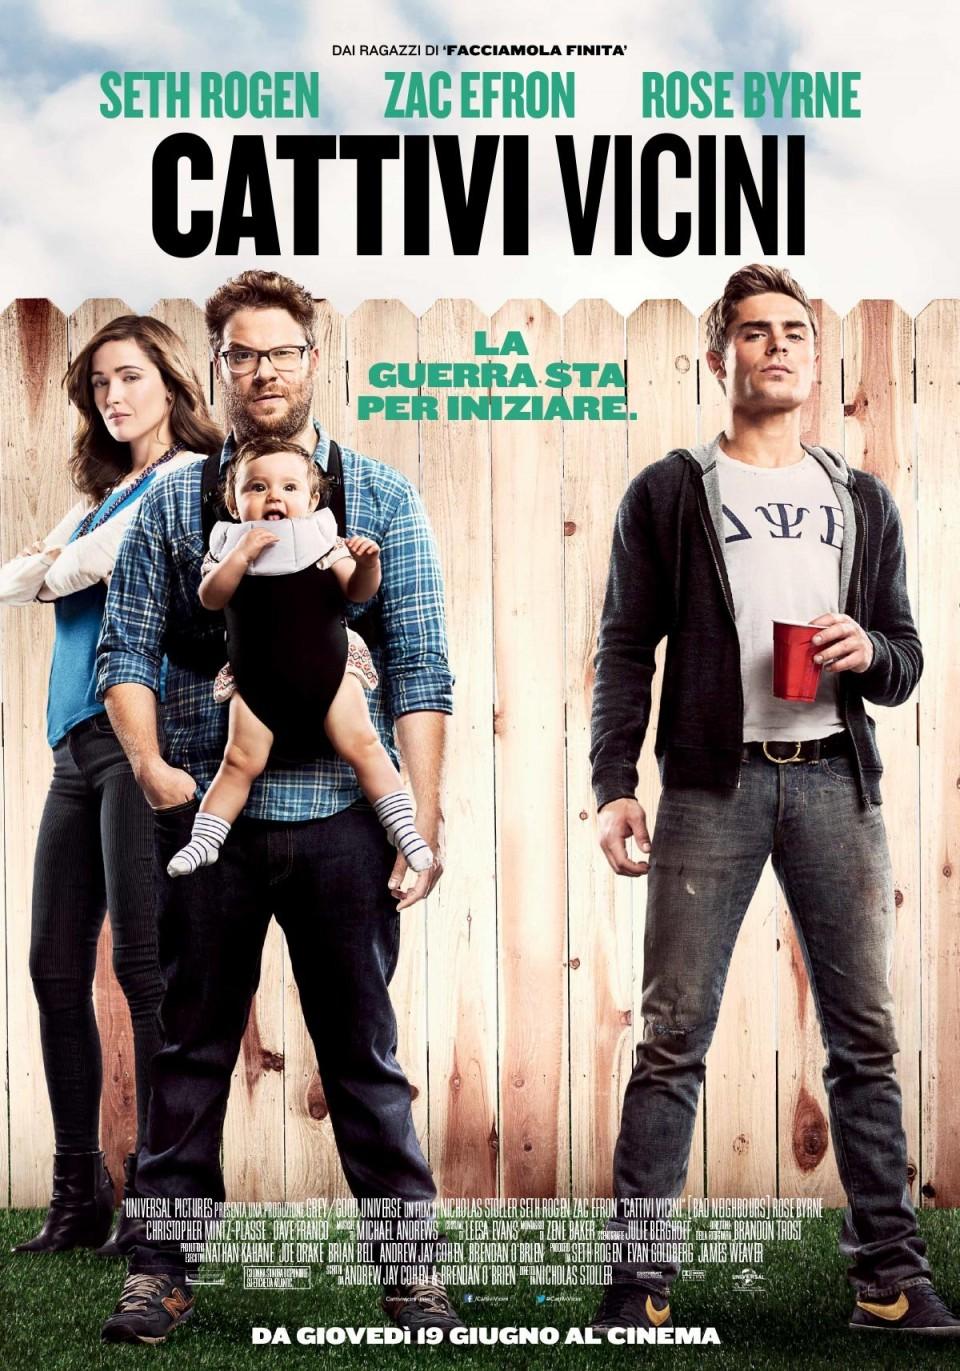 Cattivi Vicini